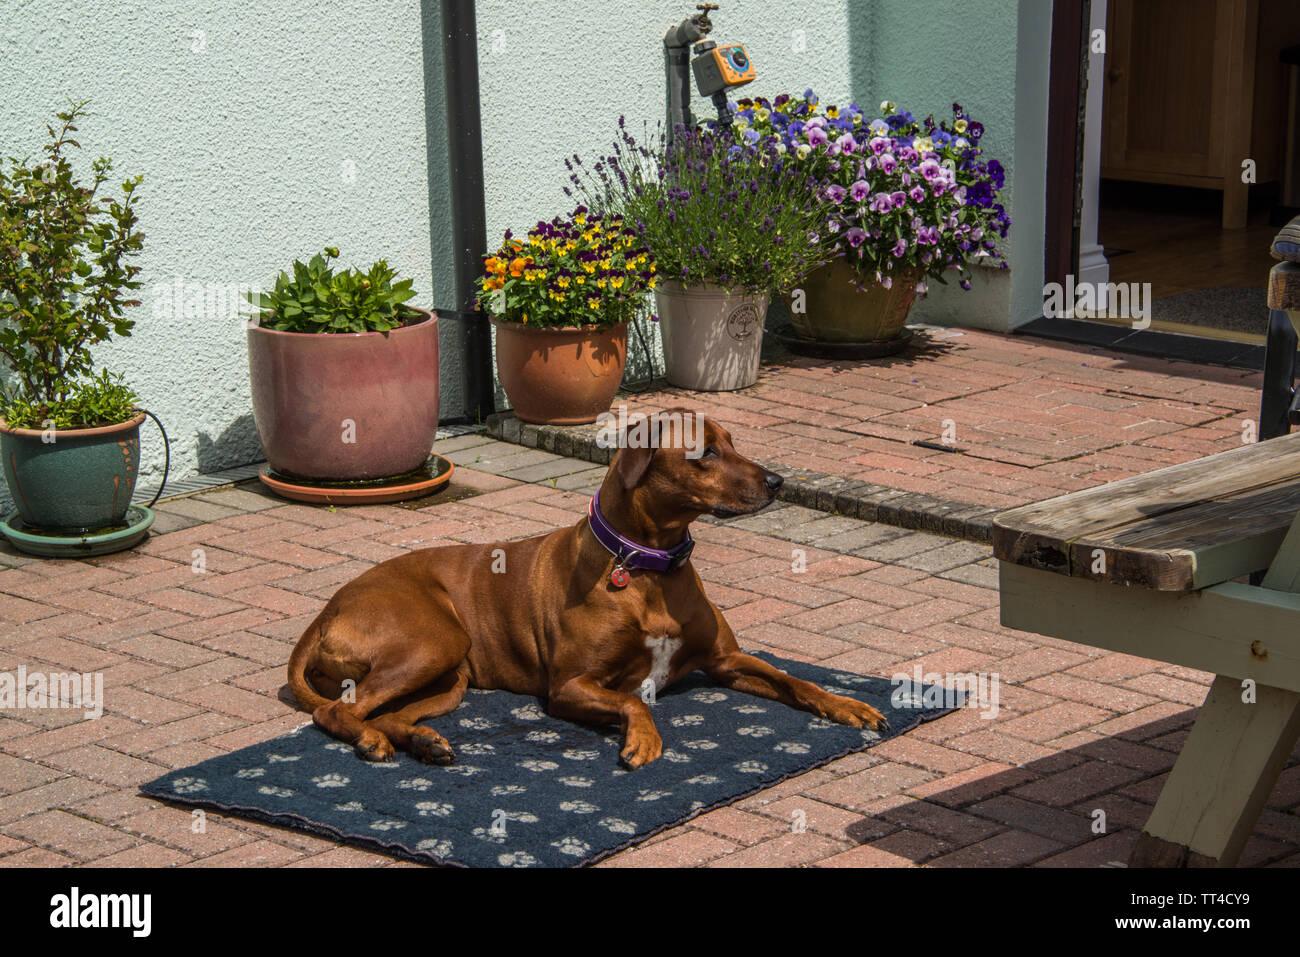 A Rhodesian Ridgeback Dog. - Stock Image